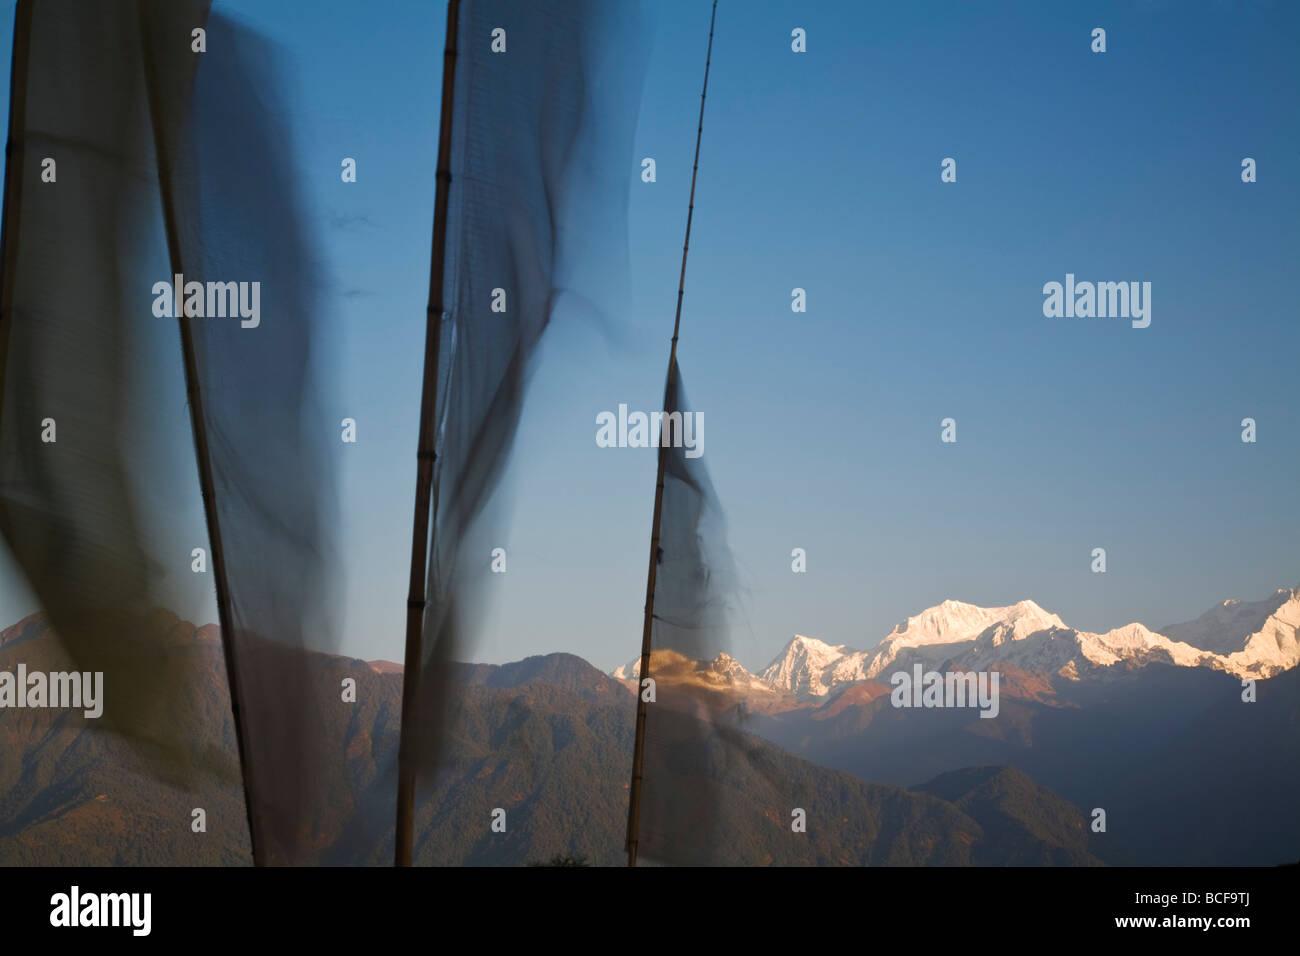 L'Inde, le Sikkim, Pelling, Upper Pelling, les drapeaux de prières et Kanchenjunga, gamme Kangchendzonga Photo Stock